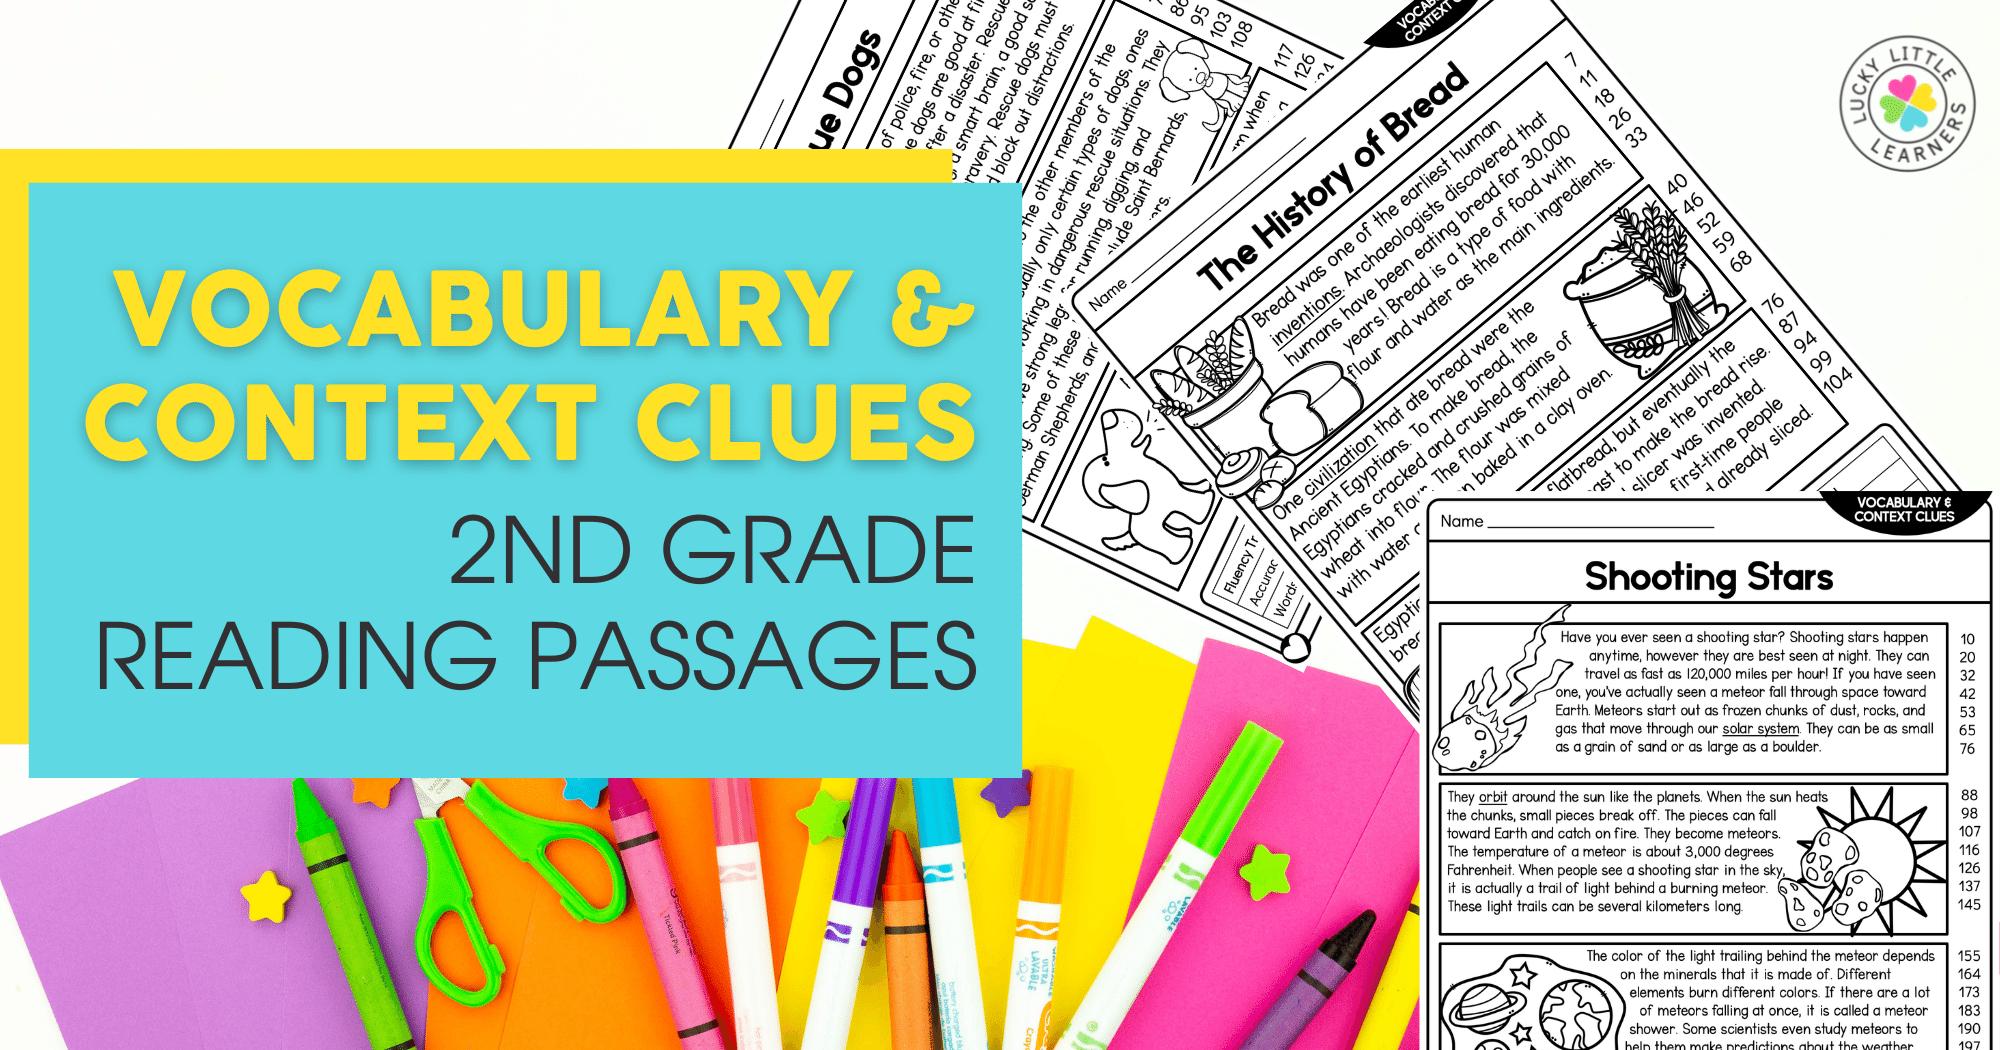 Vocabulary & Context Clues Second Grade Reading Passages